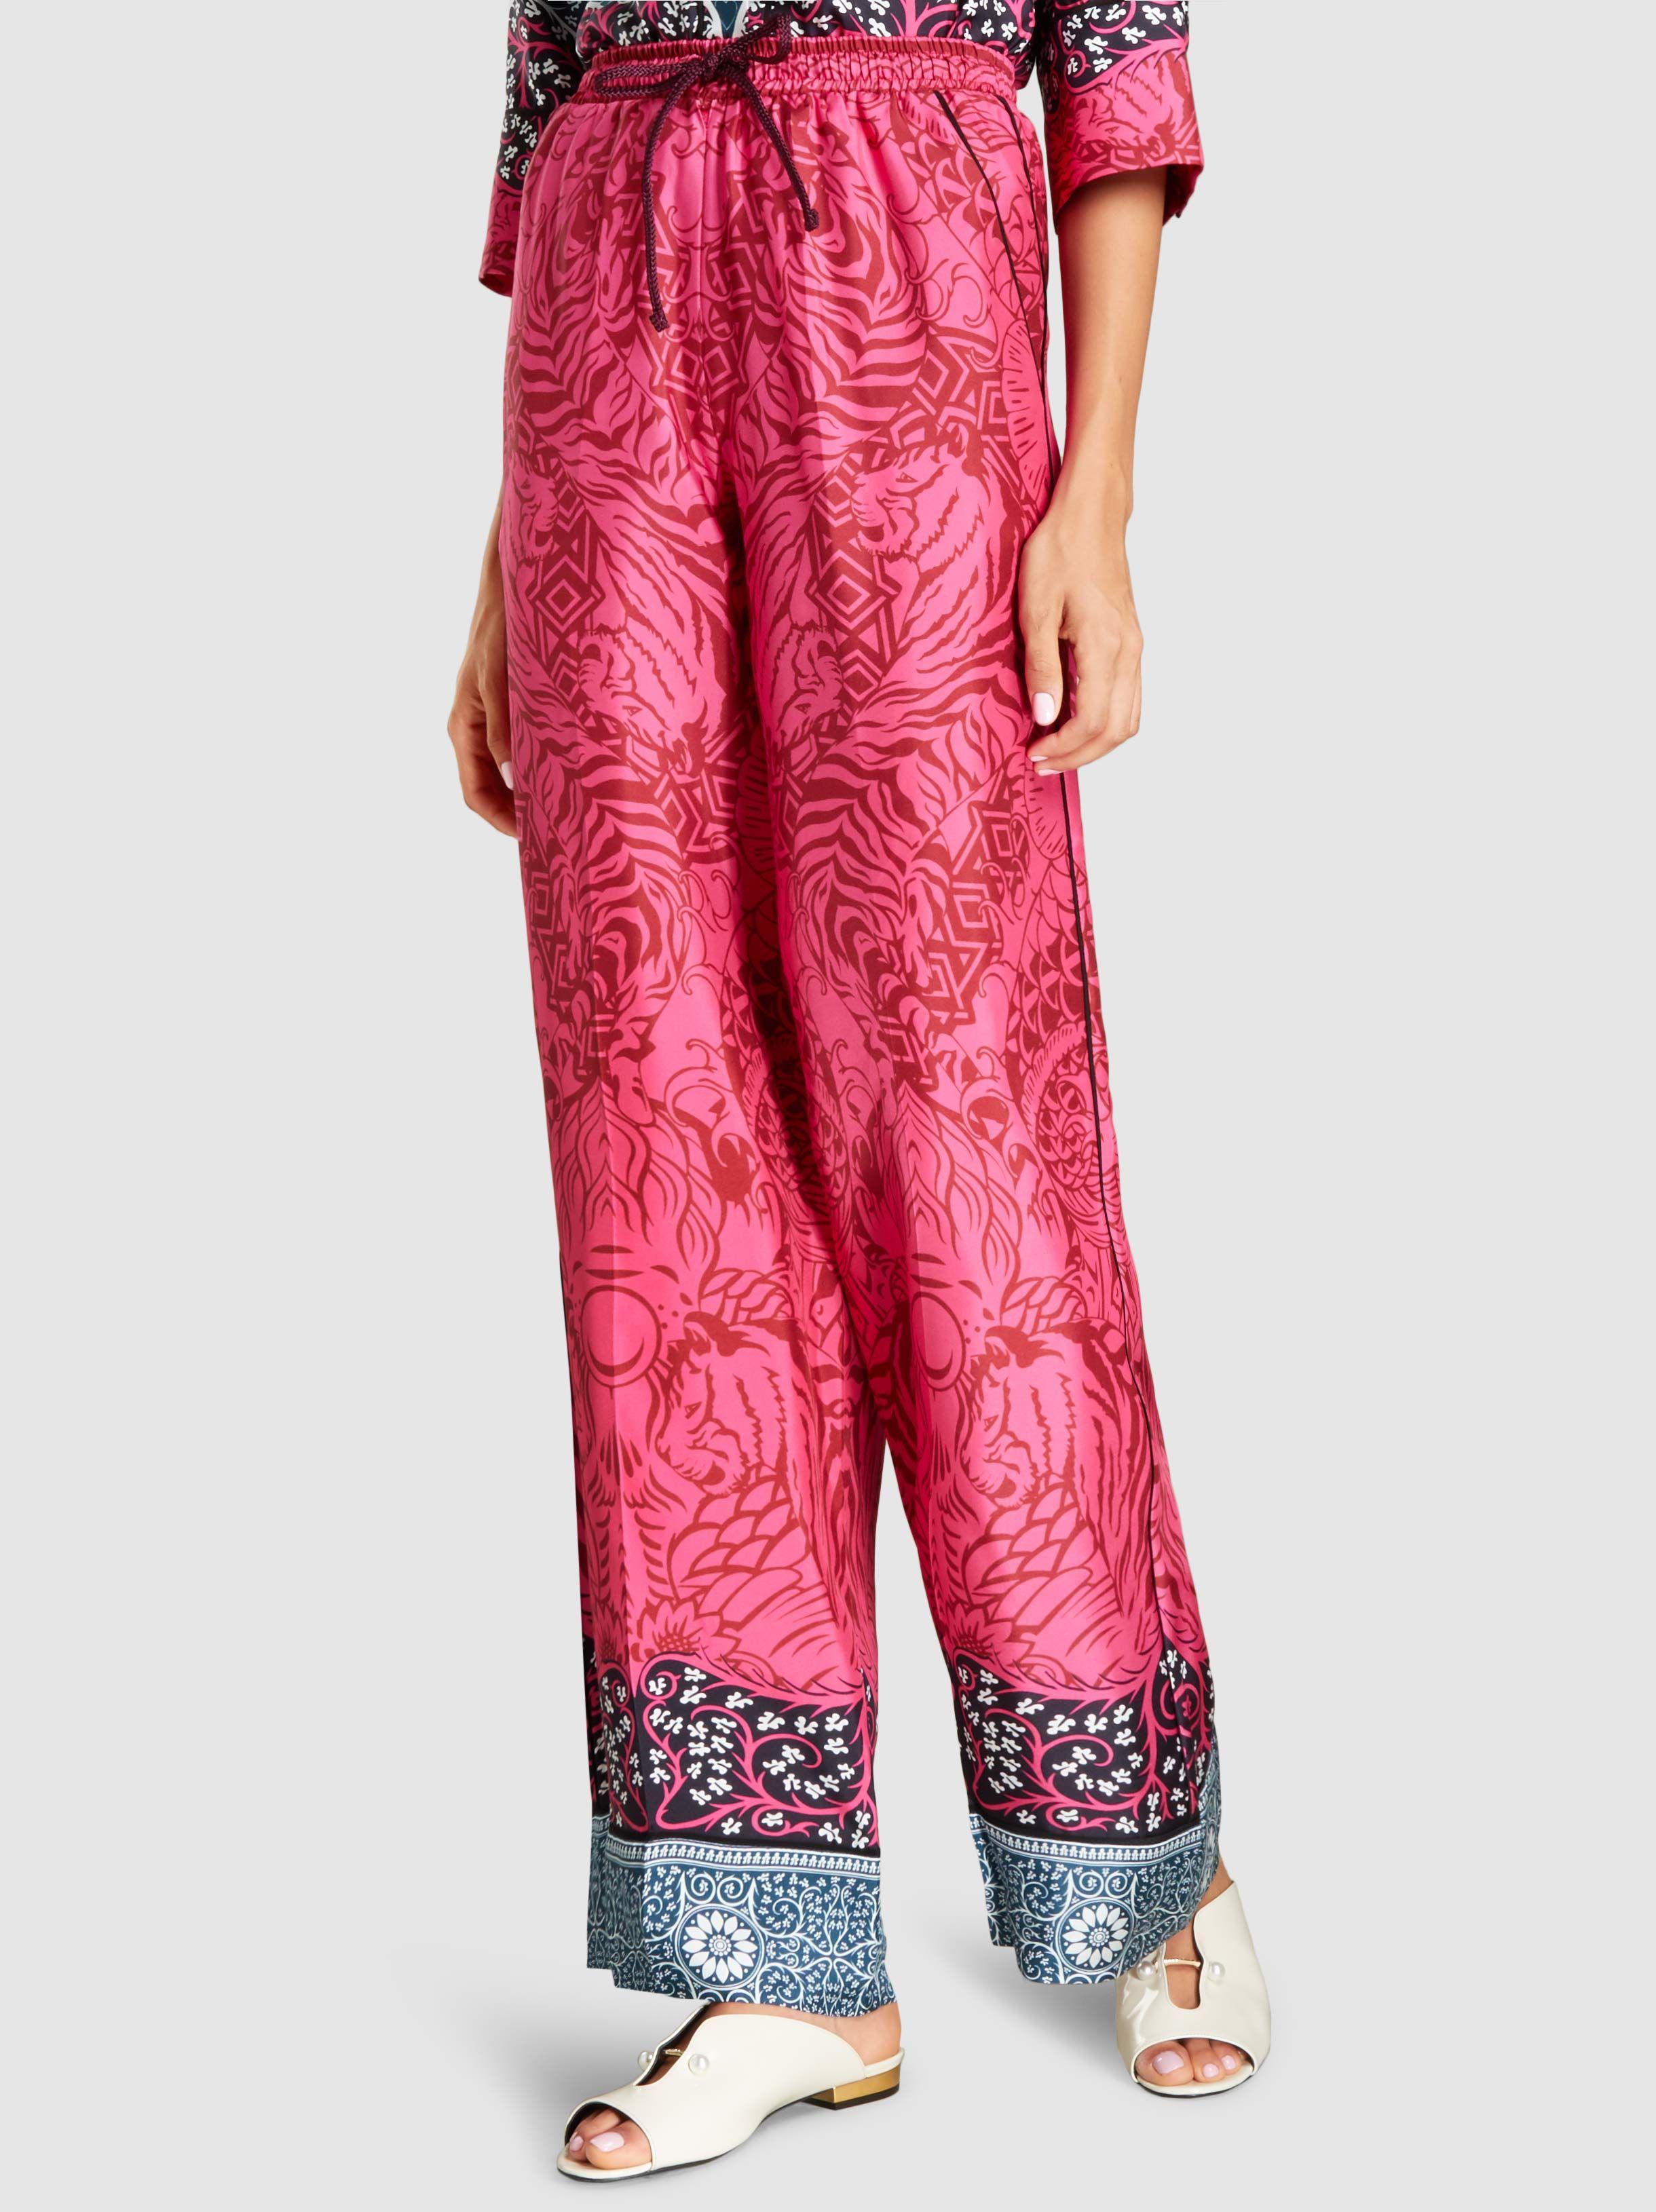 Tarots Soie Twill Pantalons Jambes Larges Mary Katrantzou 5qm6thJw